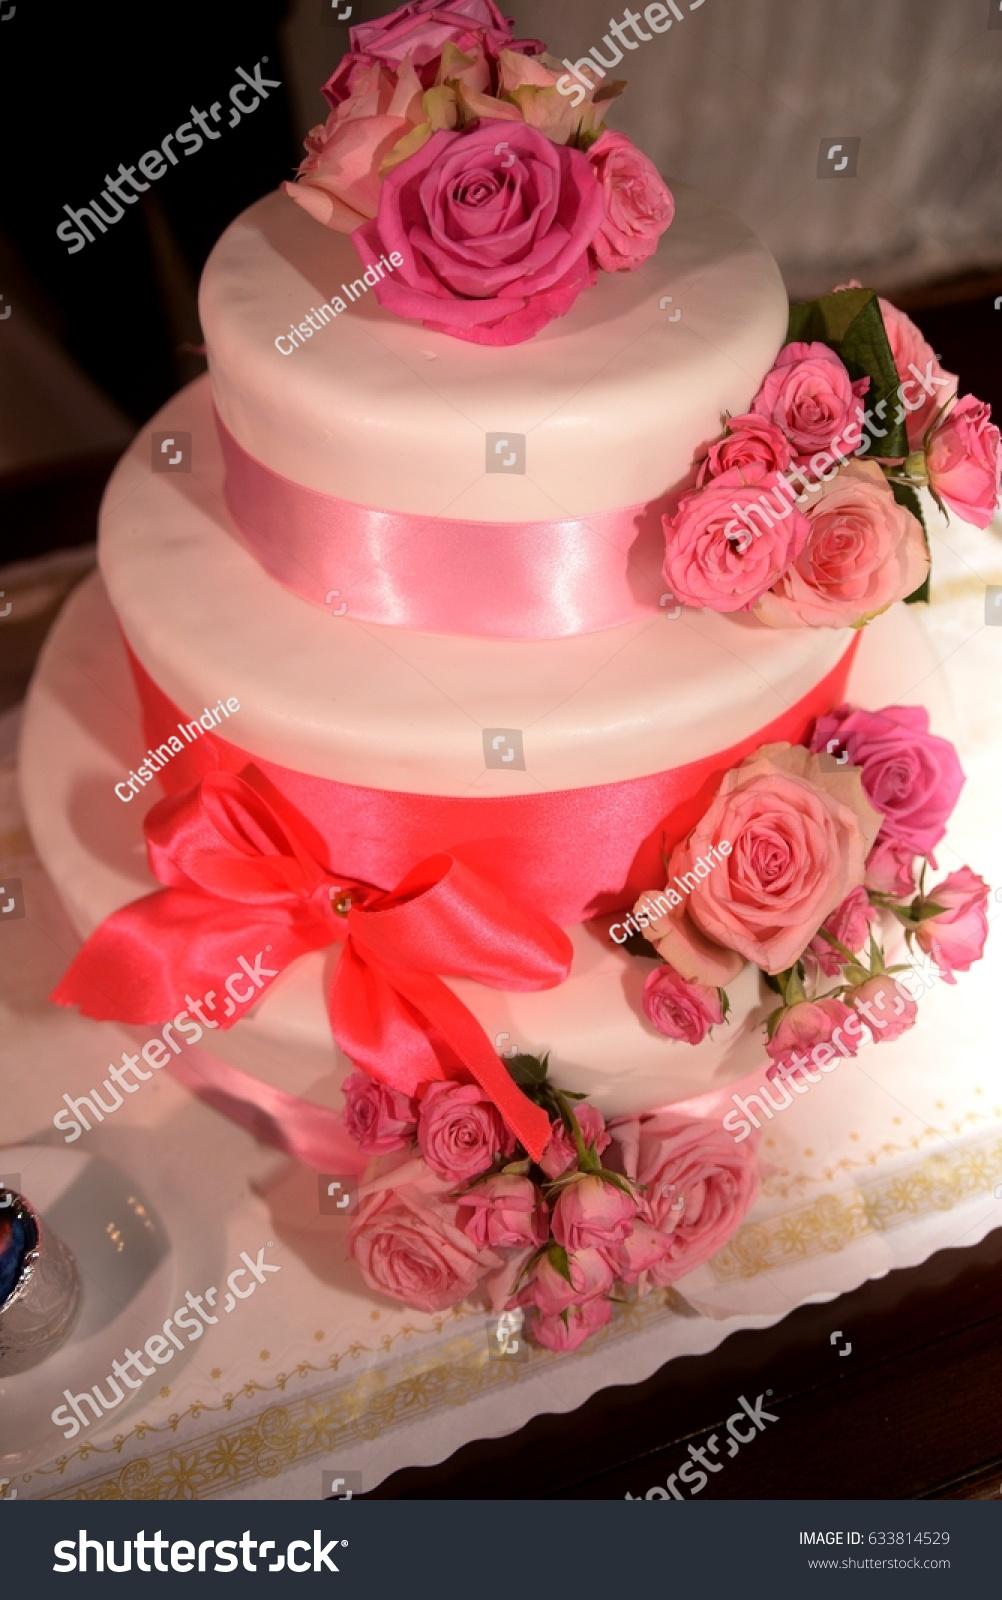 Beautiful White Pink Wedding Cake Stock Photo (Edit Now) 633814529 ...